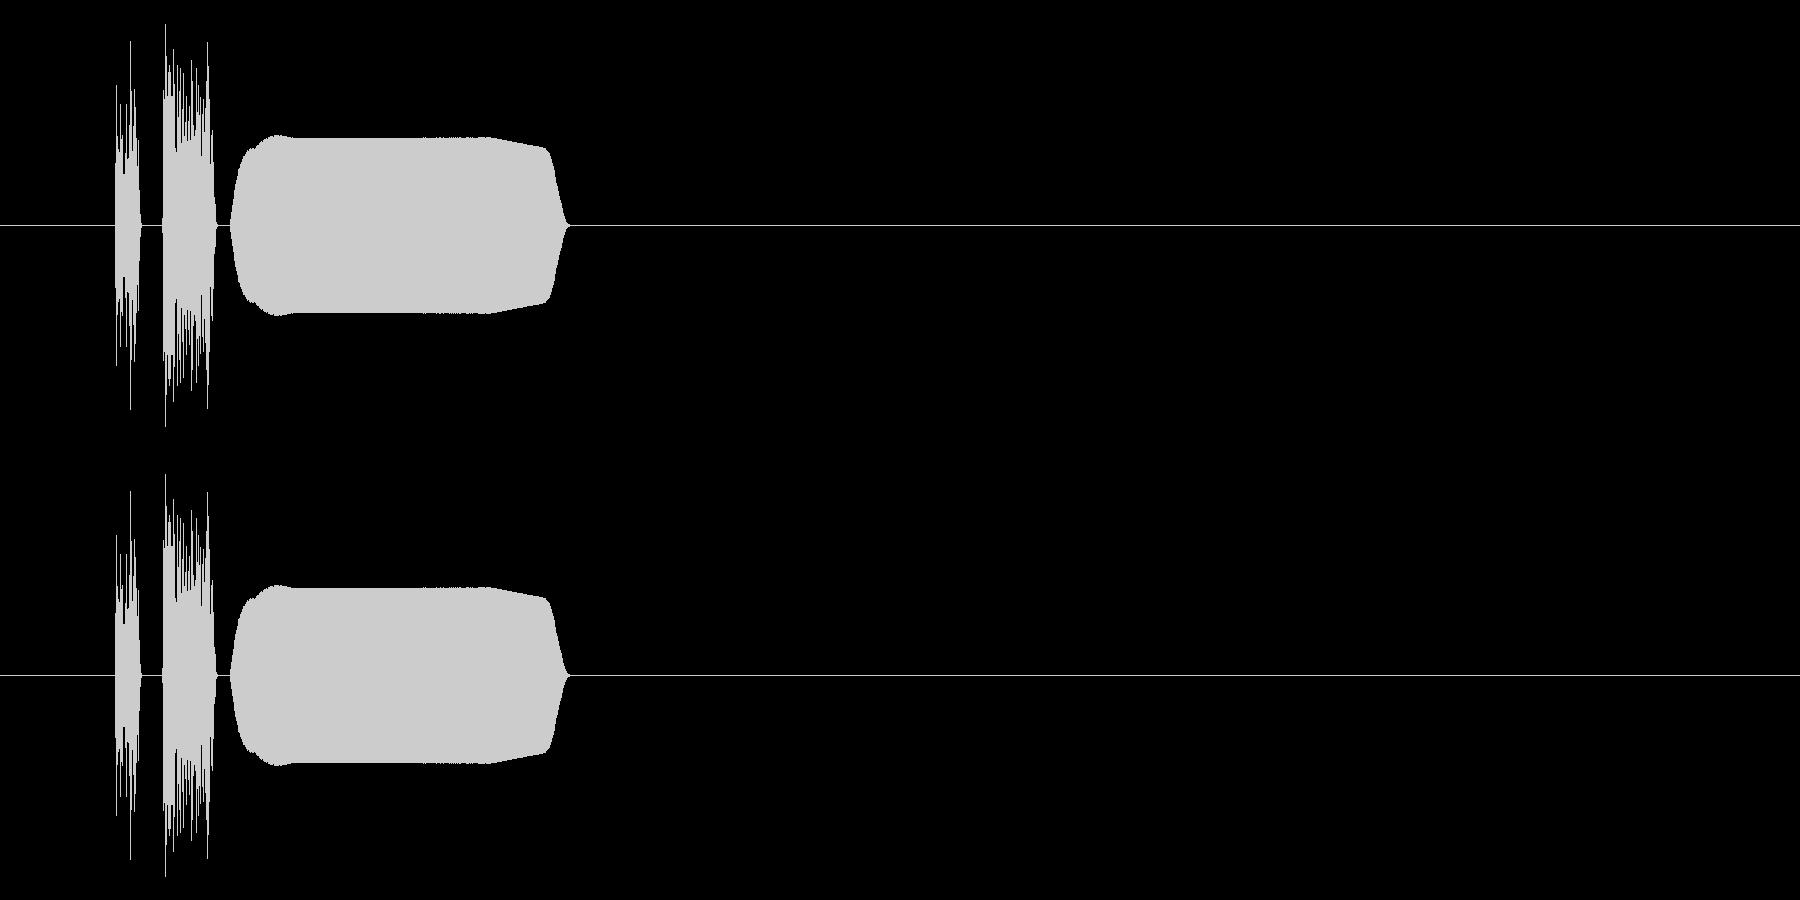 SNES-RPG05-12(ジャンプ)の未再生の波形